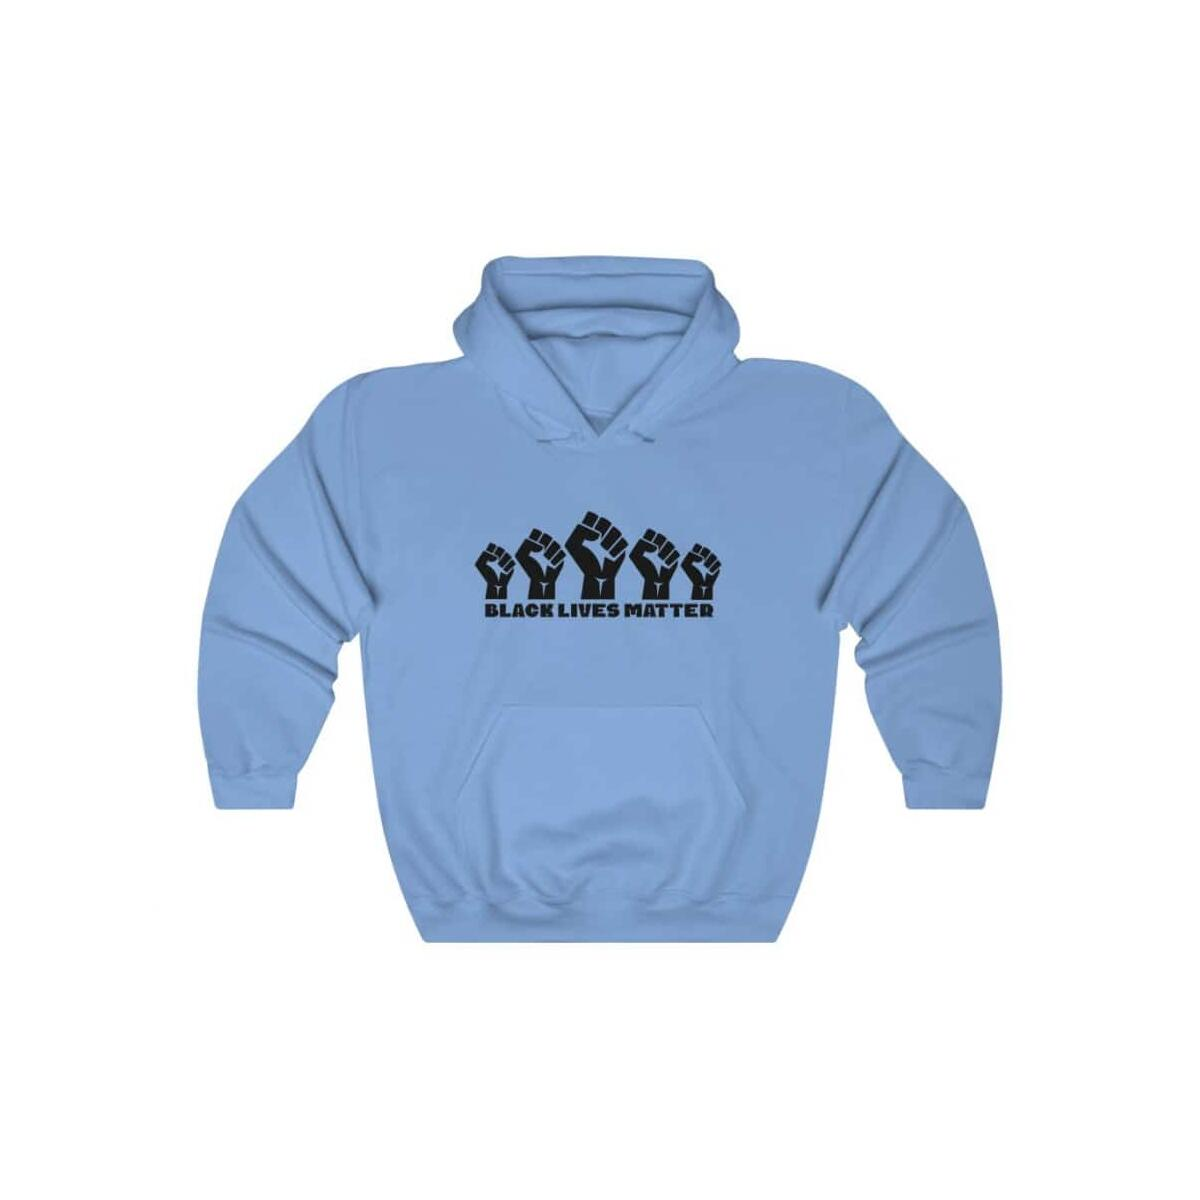 Afrocentric 5 Fists Hooded Sweatshirt, Carolina Blue / L